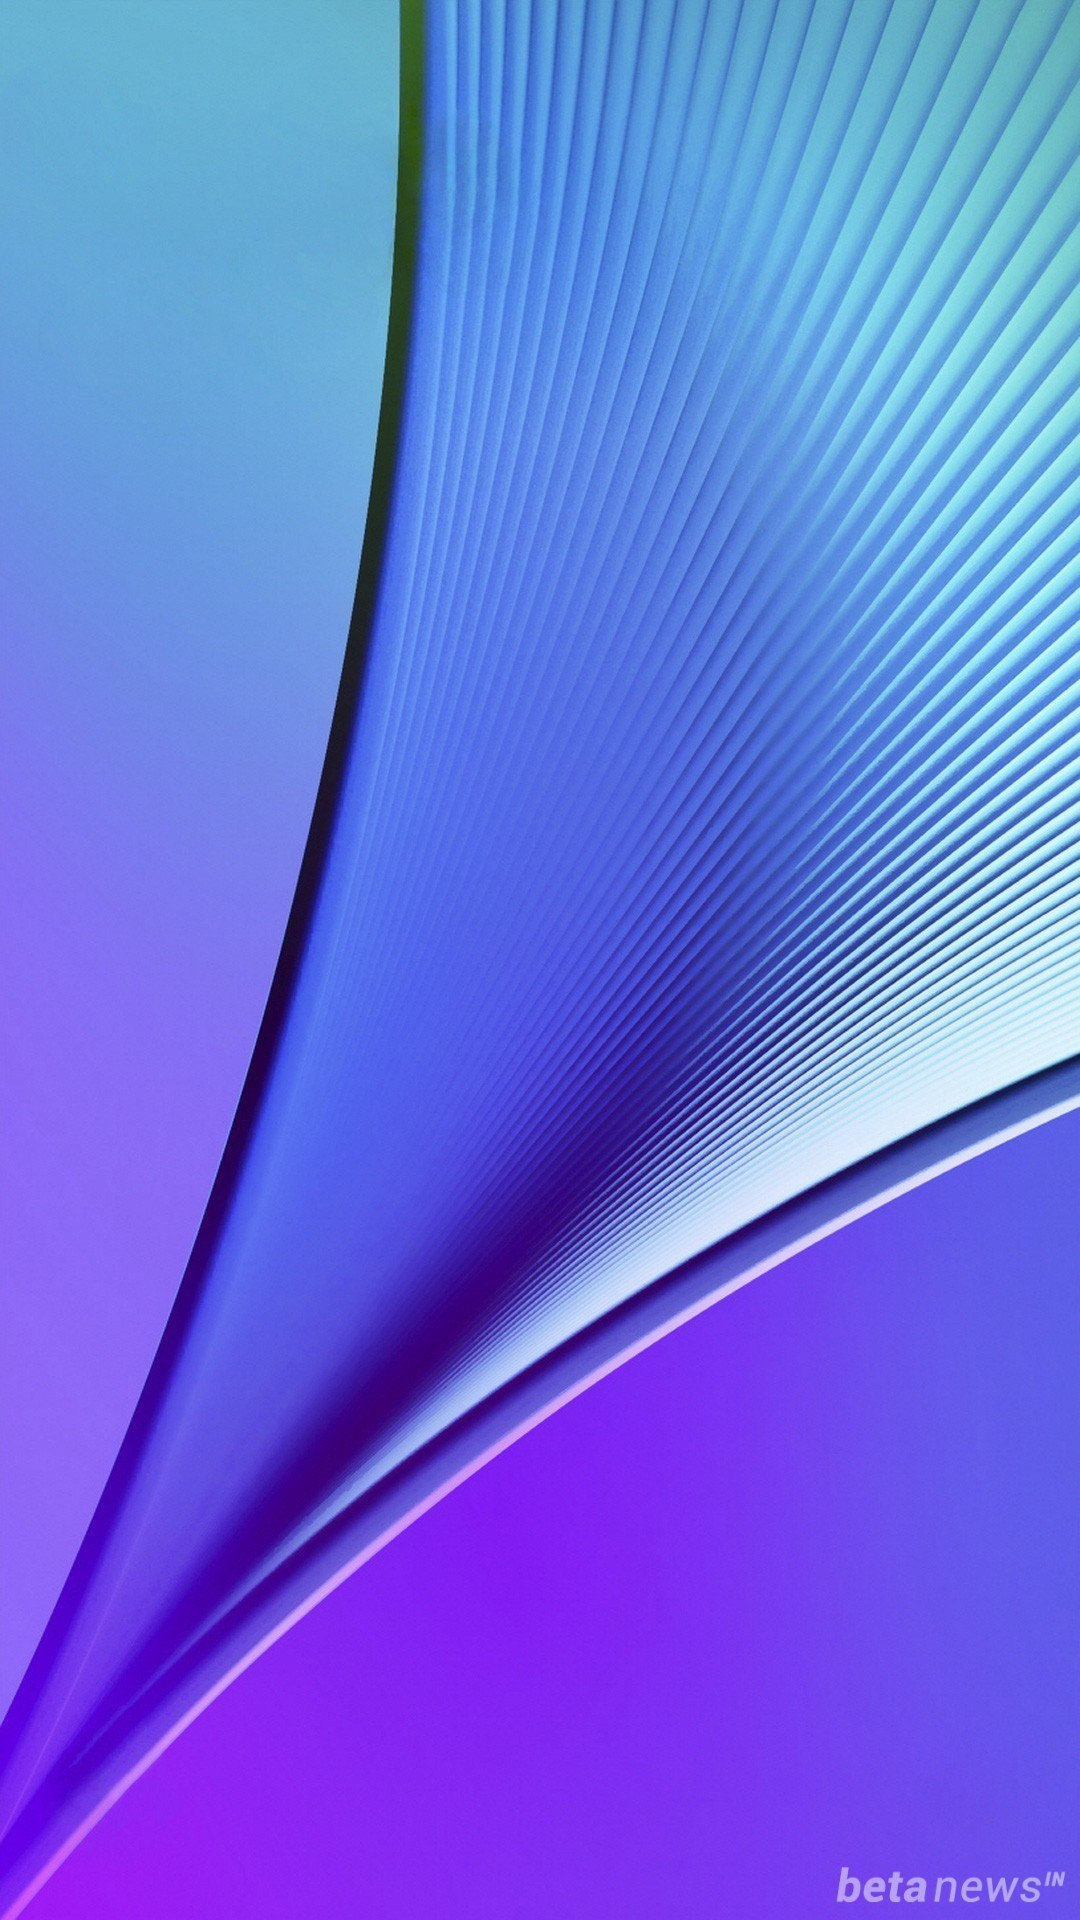 Quad HD Phone Wallpapers